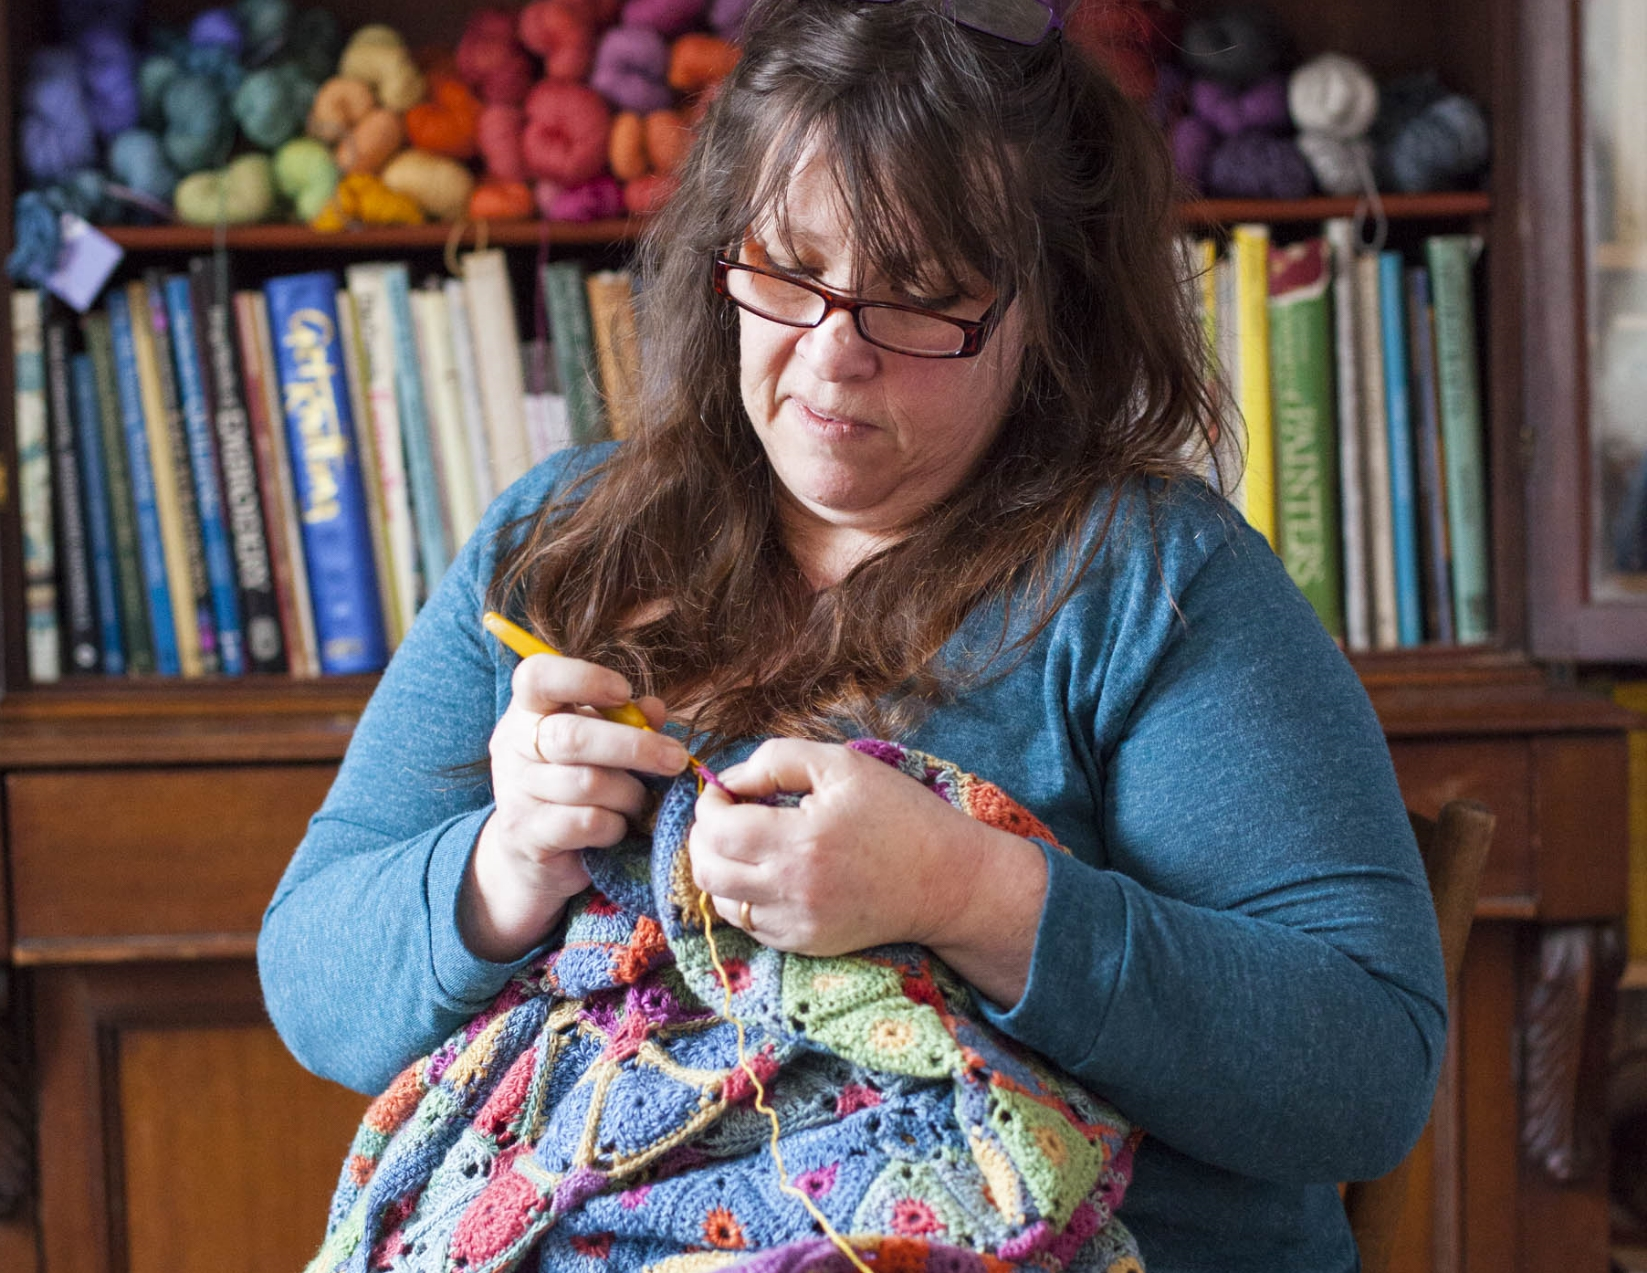 090_Crochet.jpg